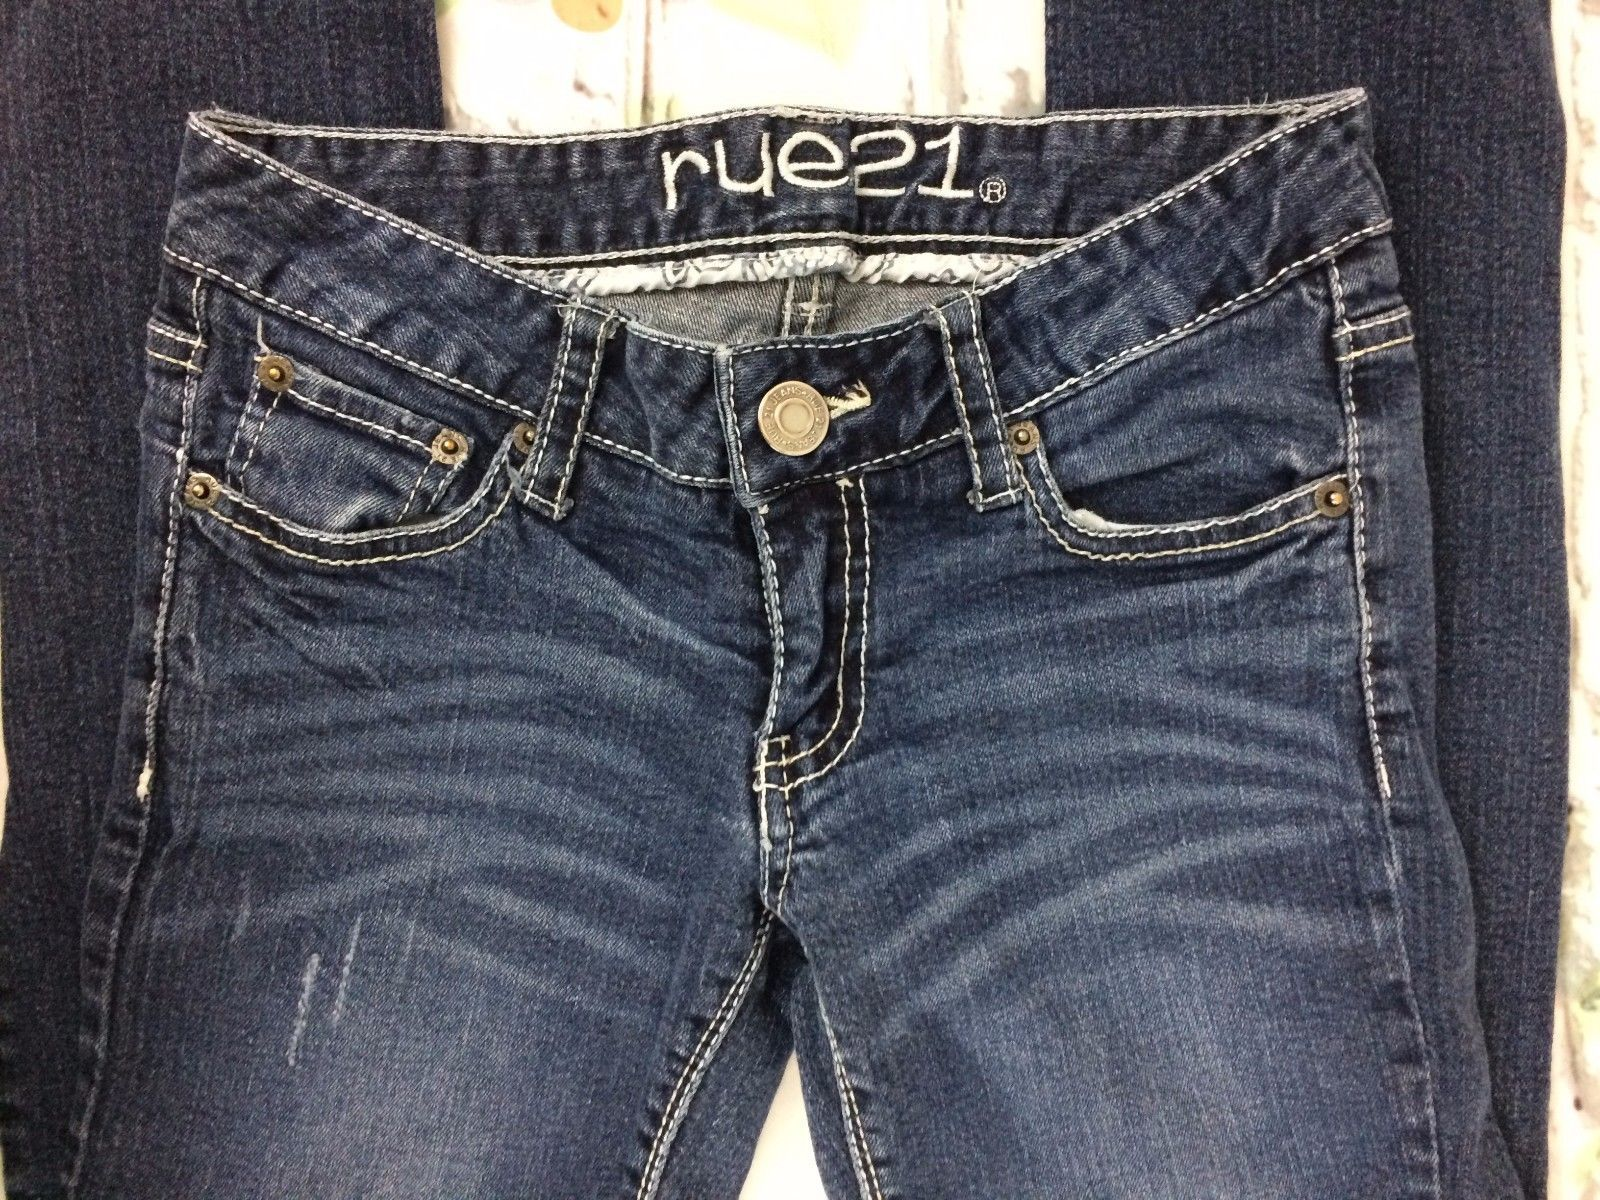 Rue21 Low Rise Skinny Jeans Regular Size 0 Medium Blue Wash LIghtly Distressed